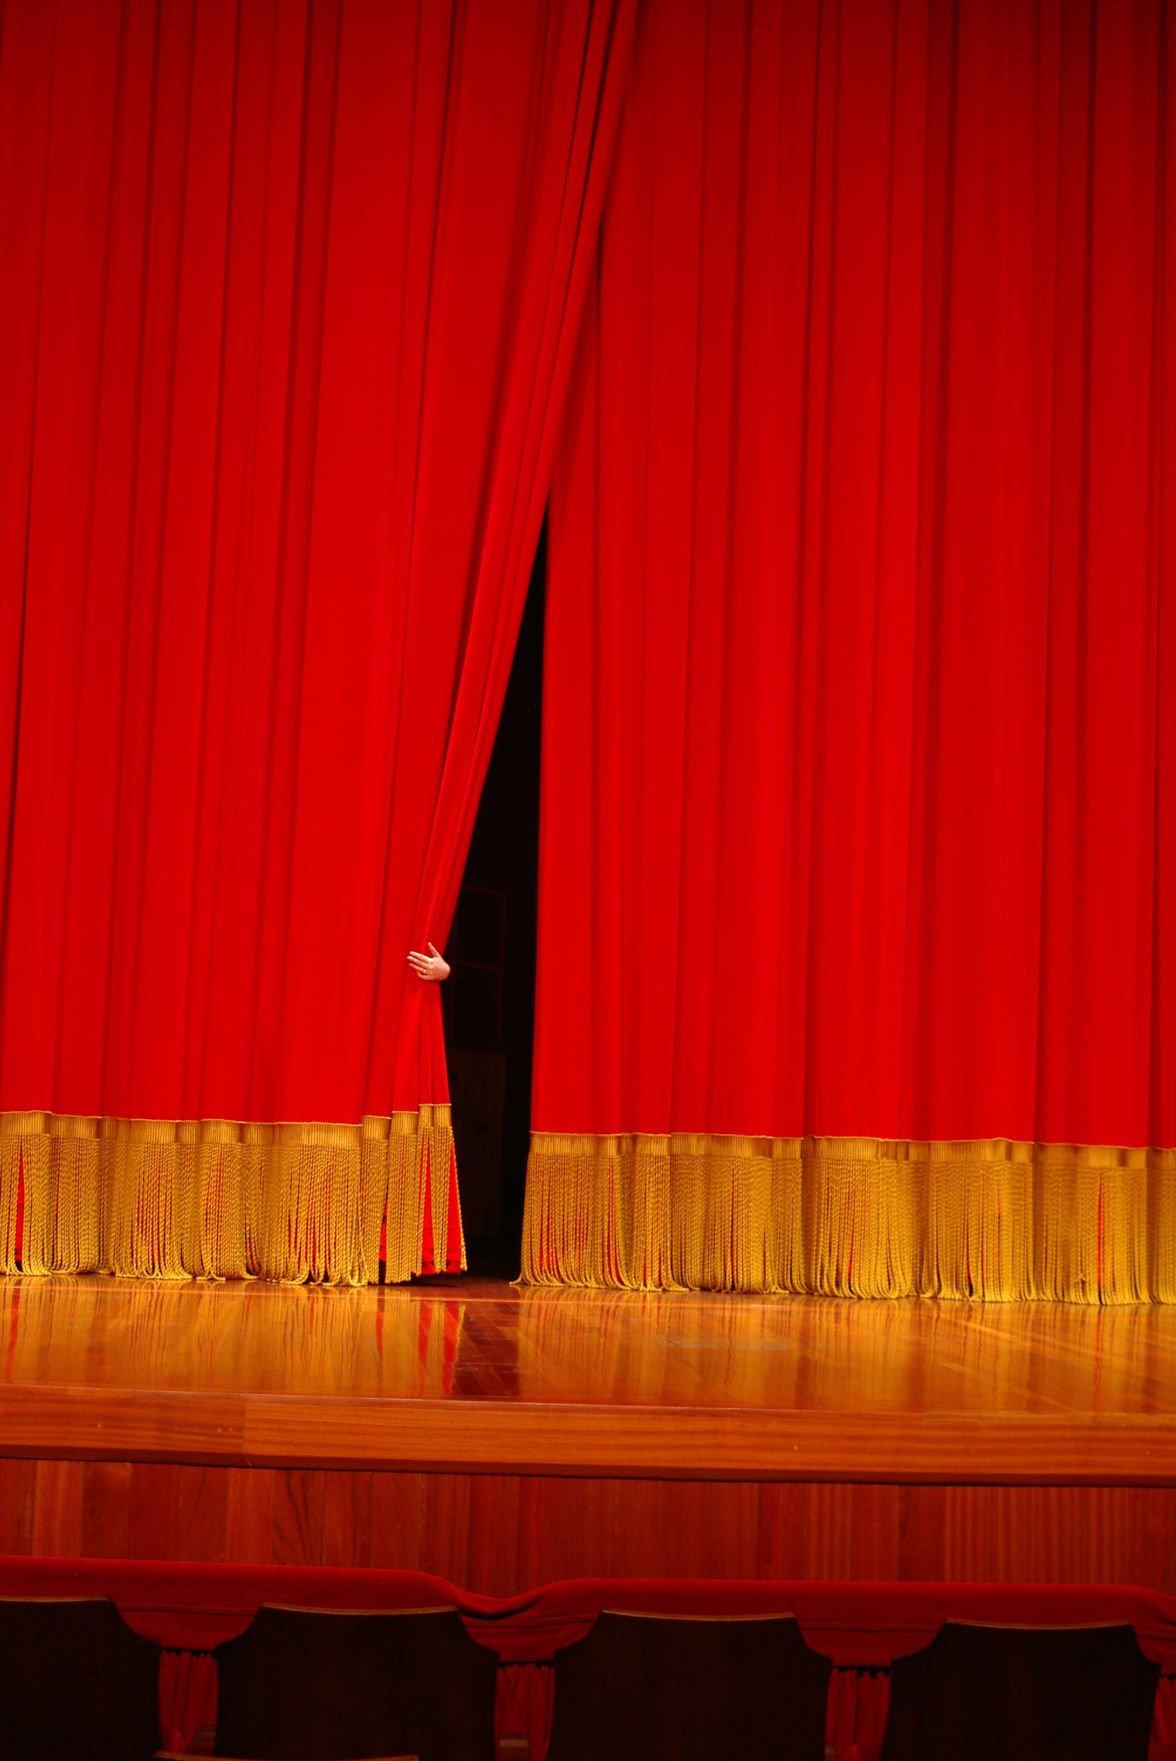 Theater curtain teaser